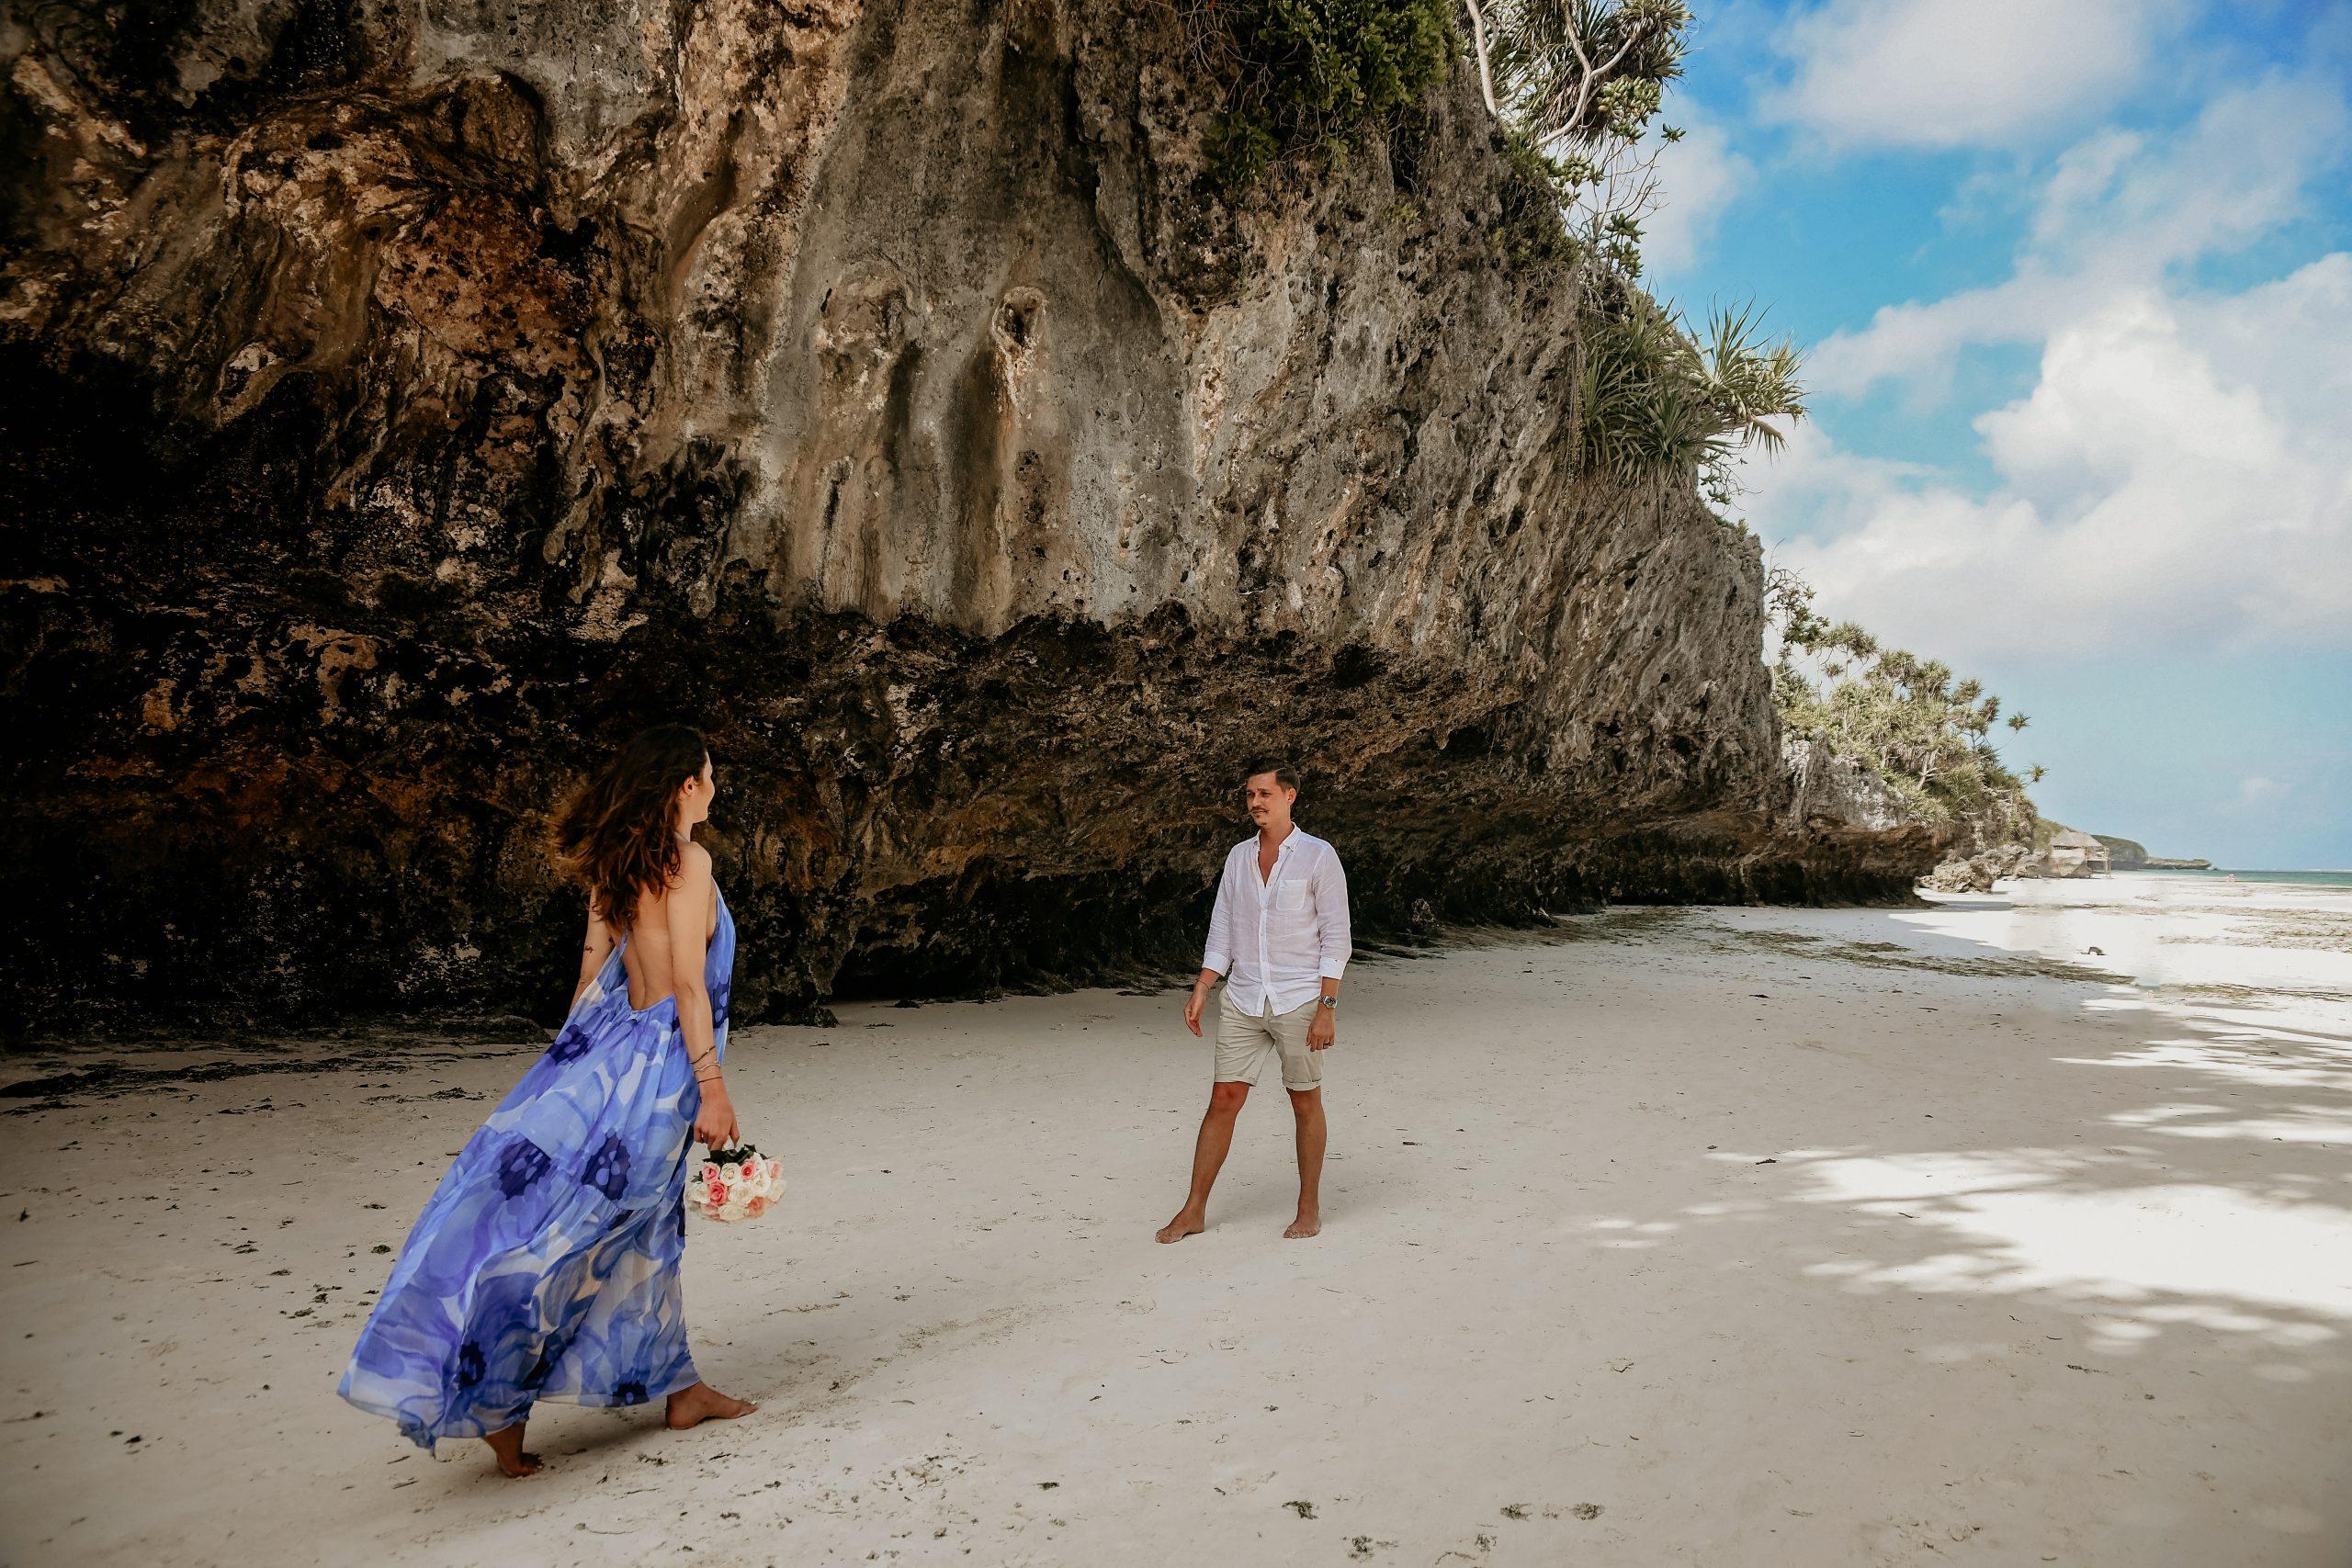 Jean și Deniz - Nunta pe Plaja, Sedinta foto pe plaja in Zanzibar